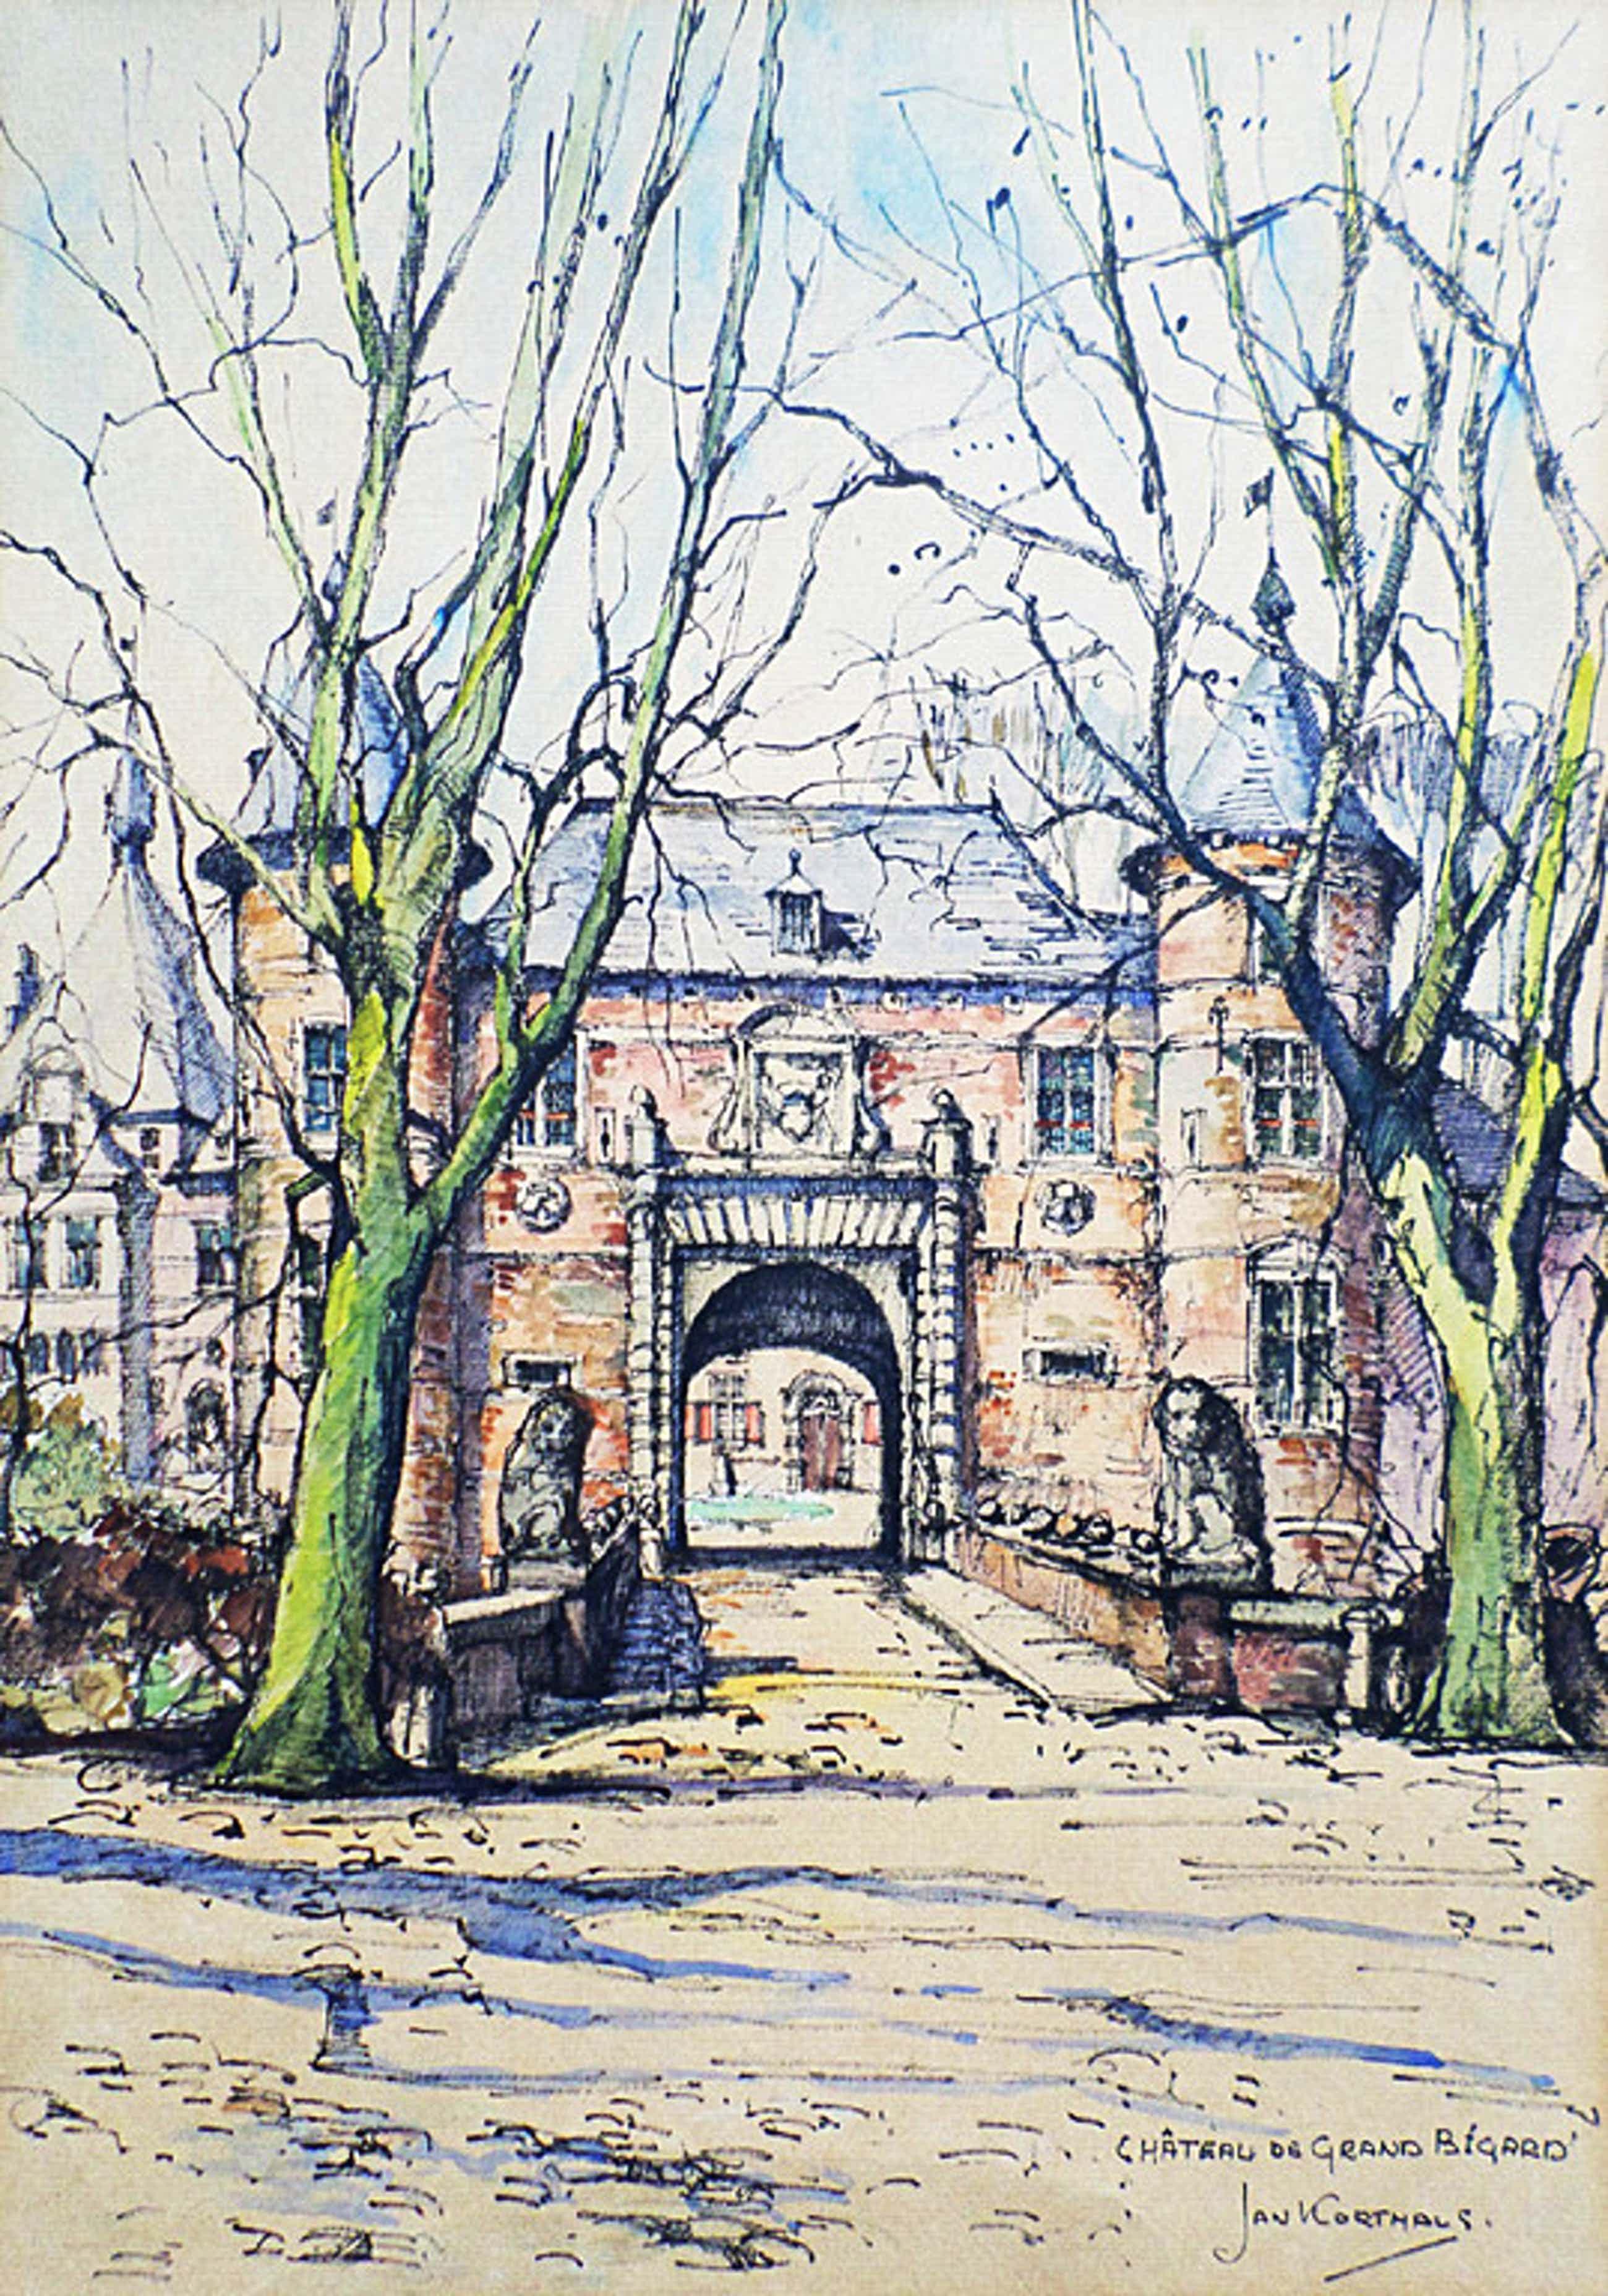 Jan Korthals – Chateau de Grand Bigard, tekening / aquarel kopen? Bied vanaf 75!